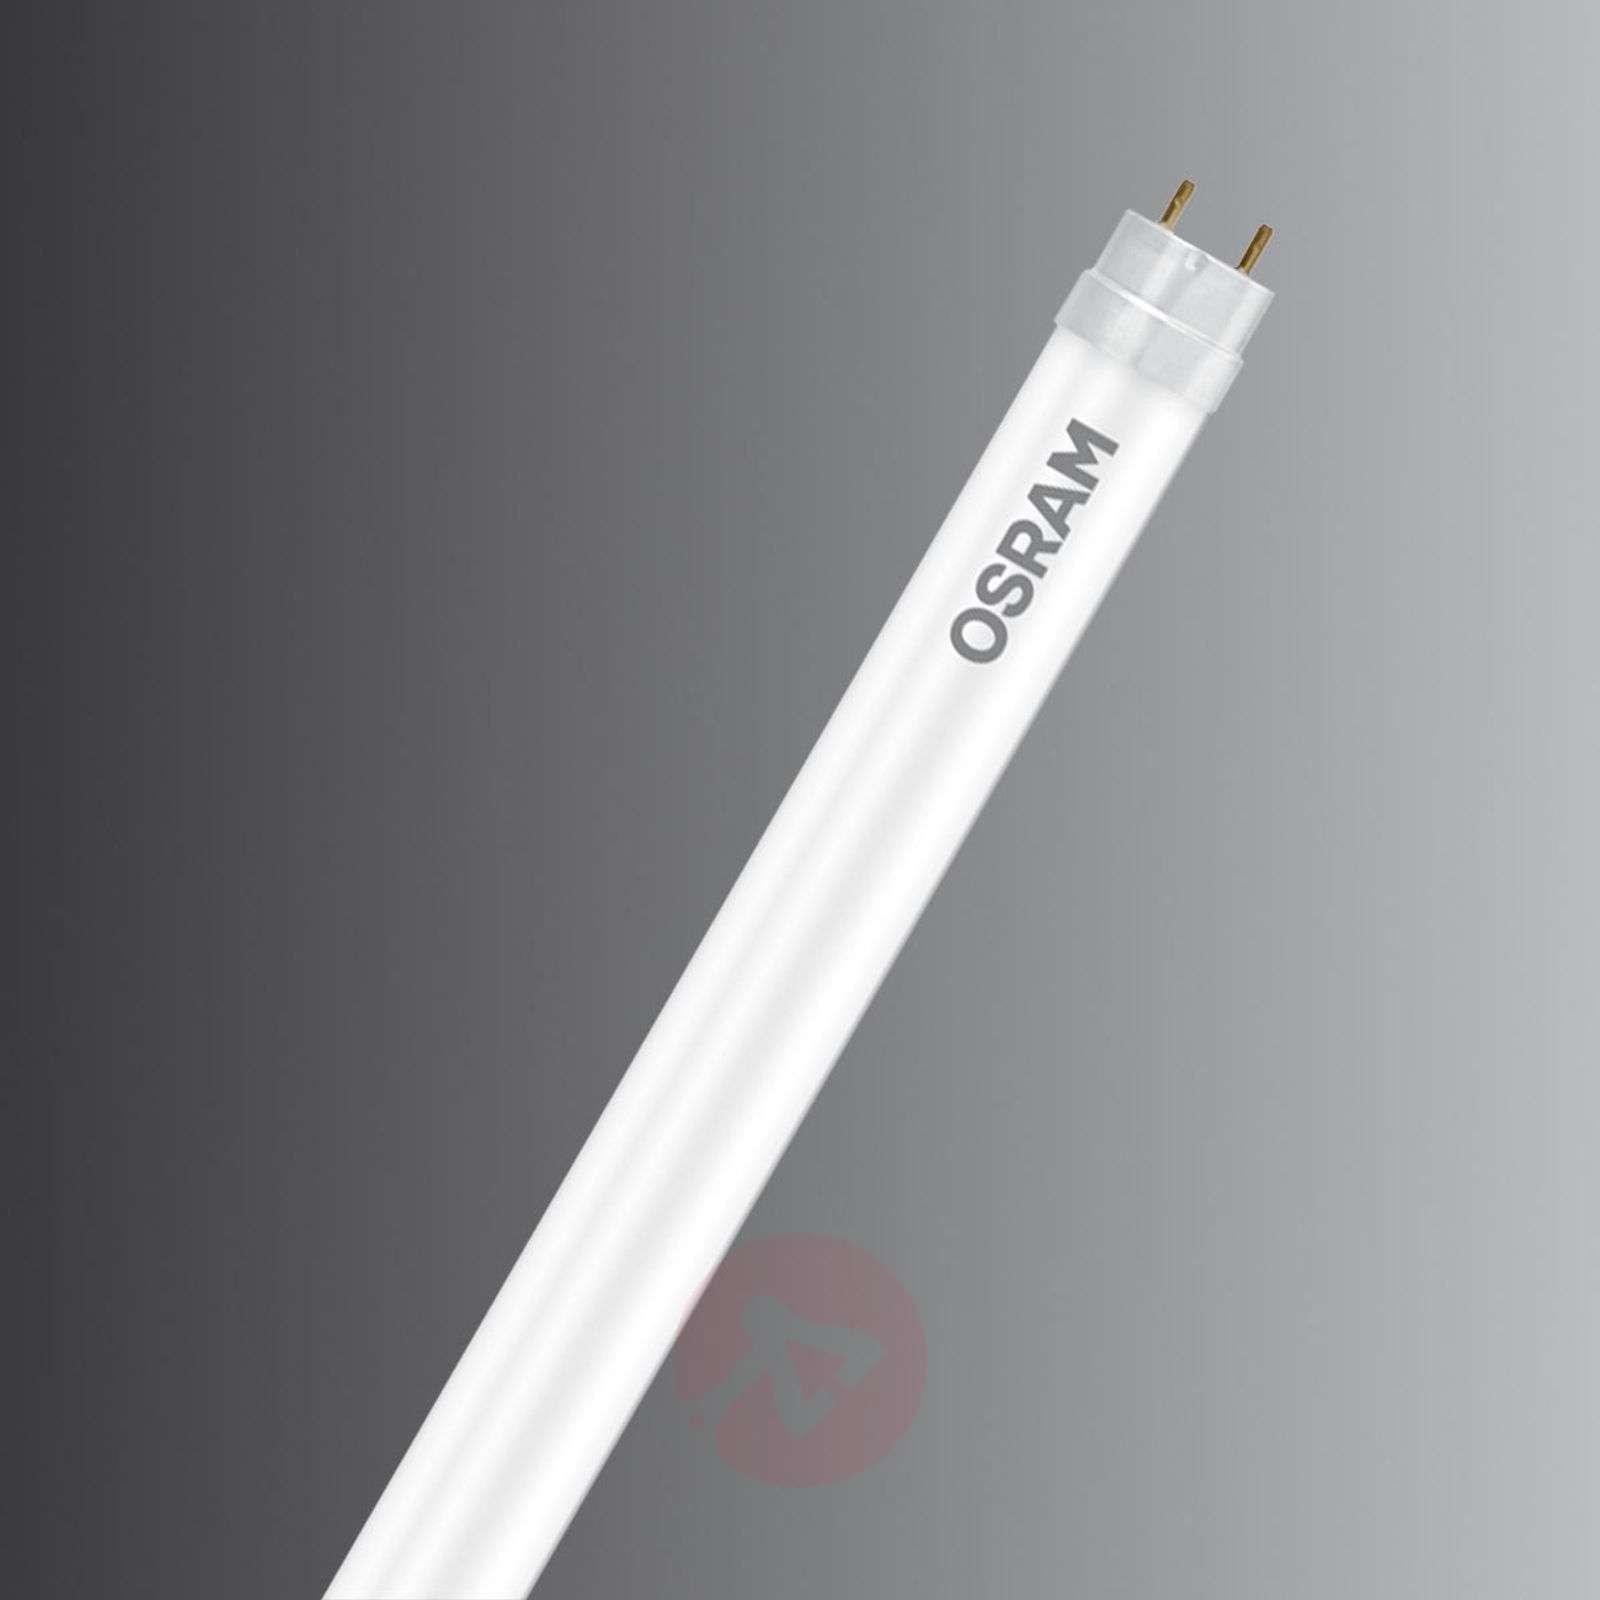 LED SubstiTube G13 T8 19.1W, cool white, 2,000 lm-7262134-01